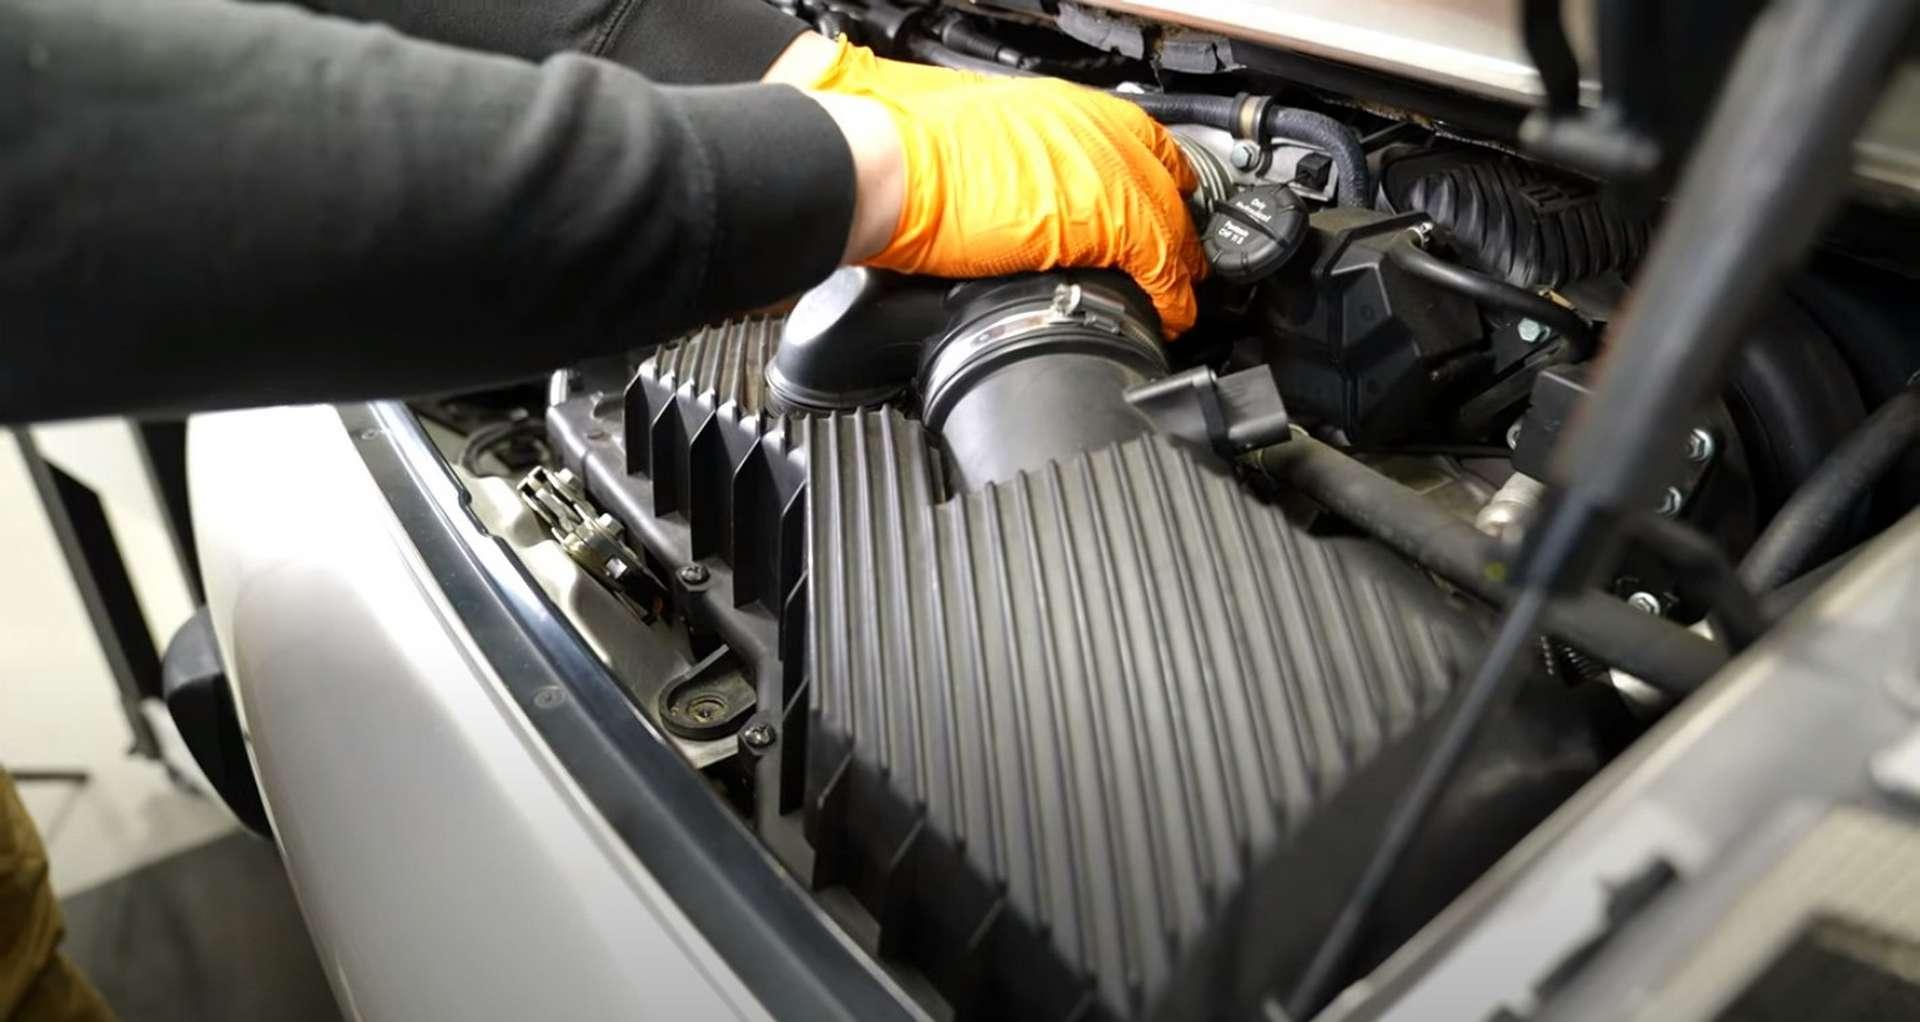 04-DIY-Porsche-996-Engine-Mount-Replacement_Removing_Intake